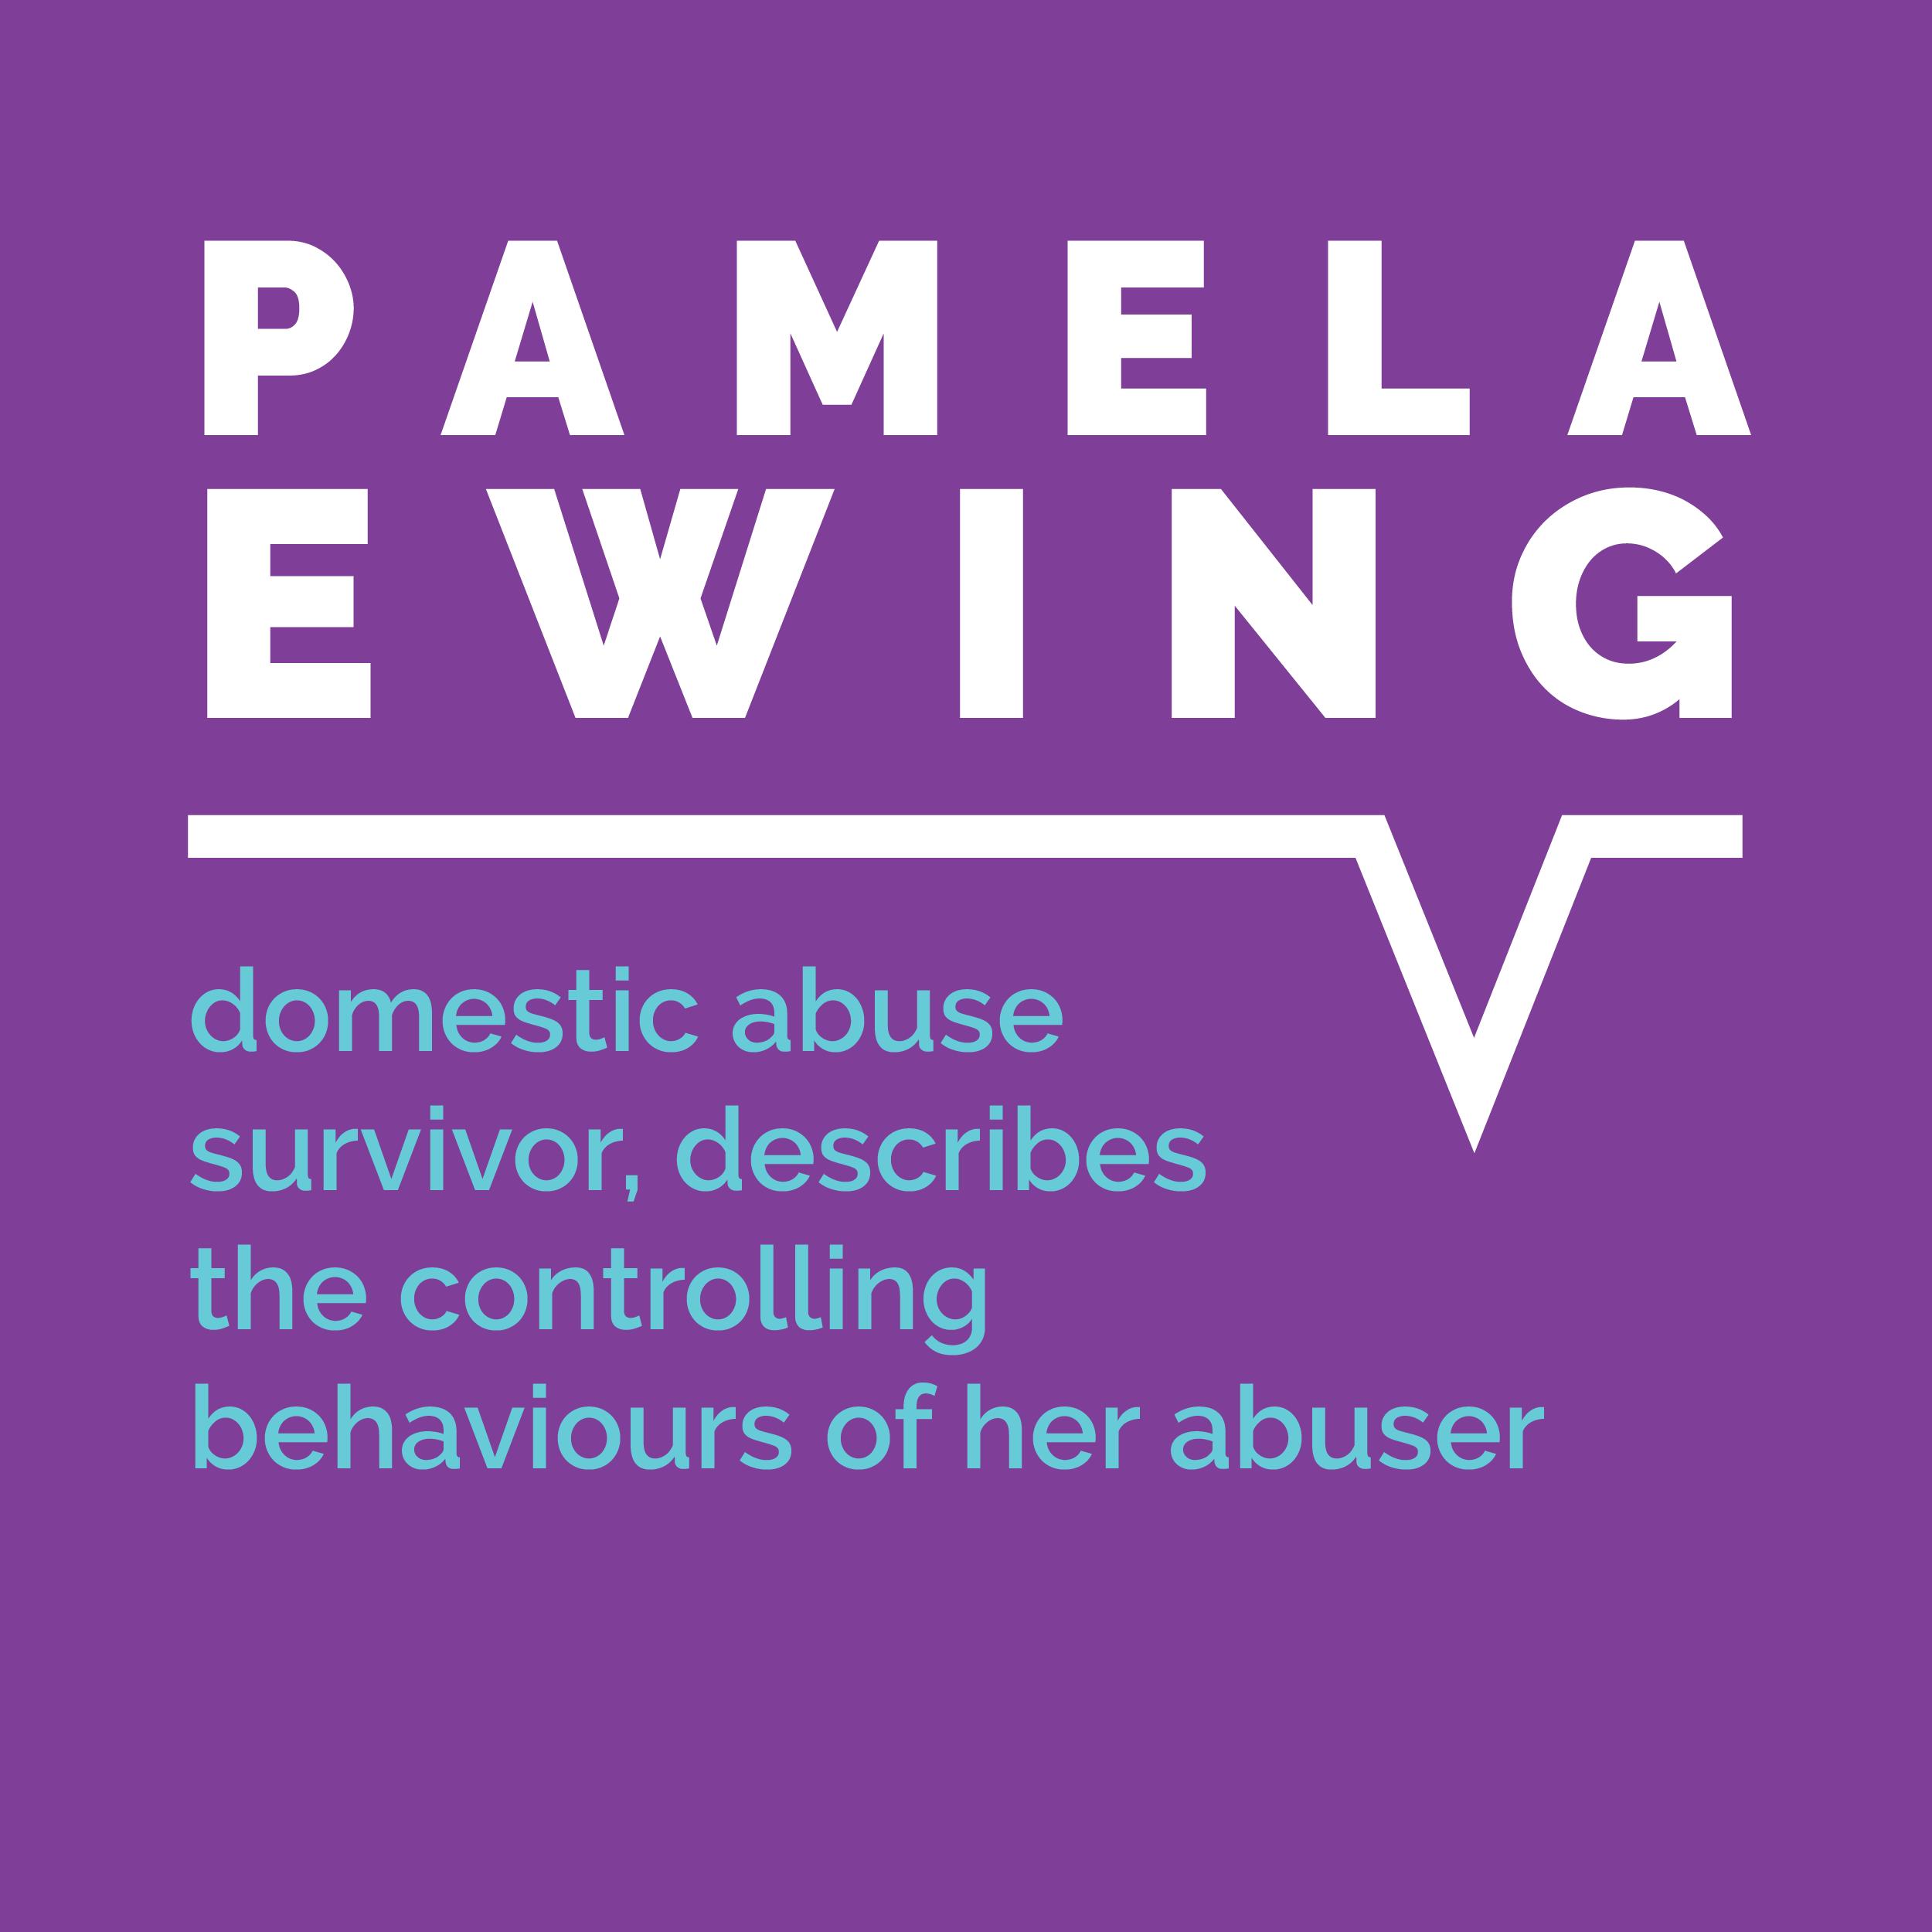 Pamela Ewing, domestic abuse survivor, describes the controlling behaviours of her abuser